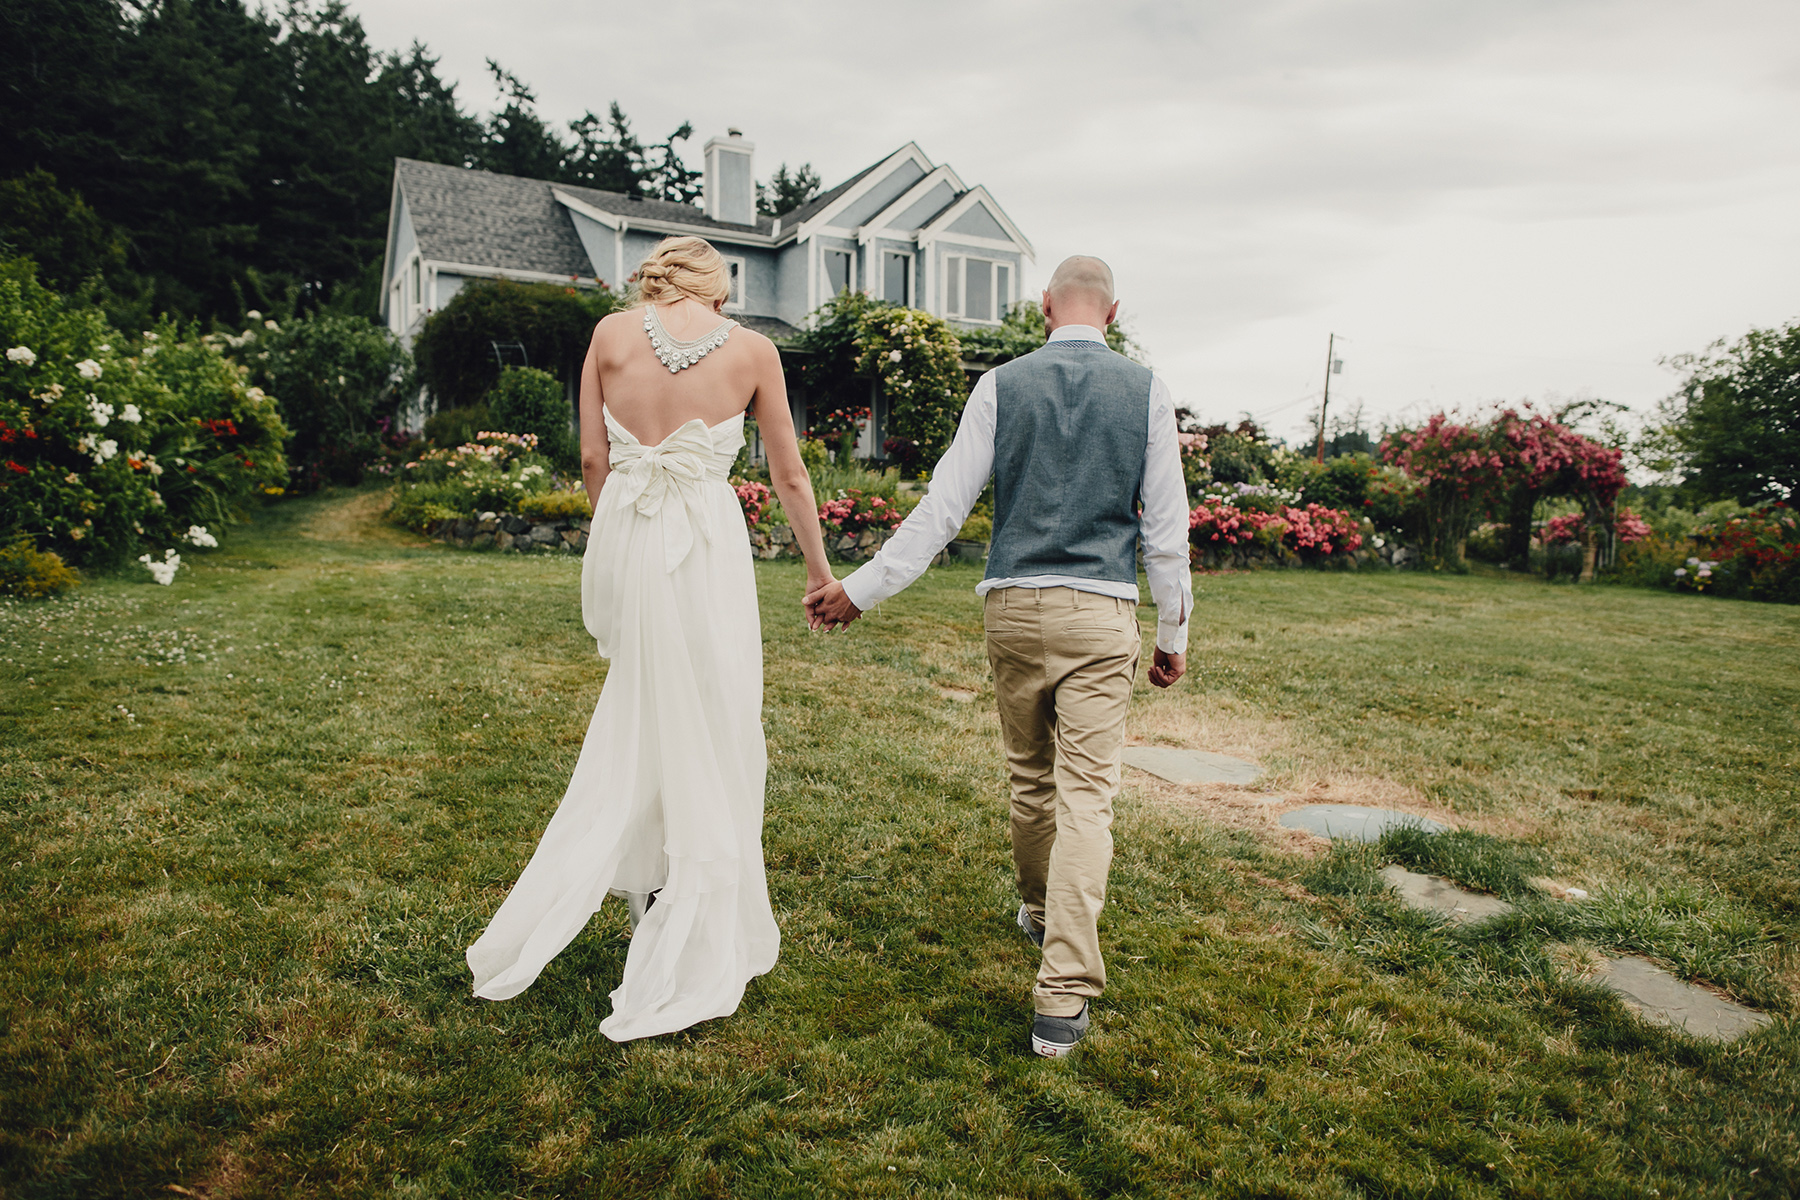 kildara-farms-wedding-photo-inspiration-0074